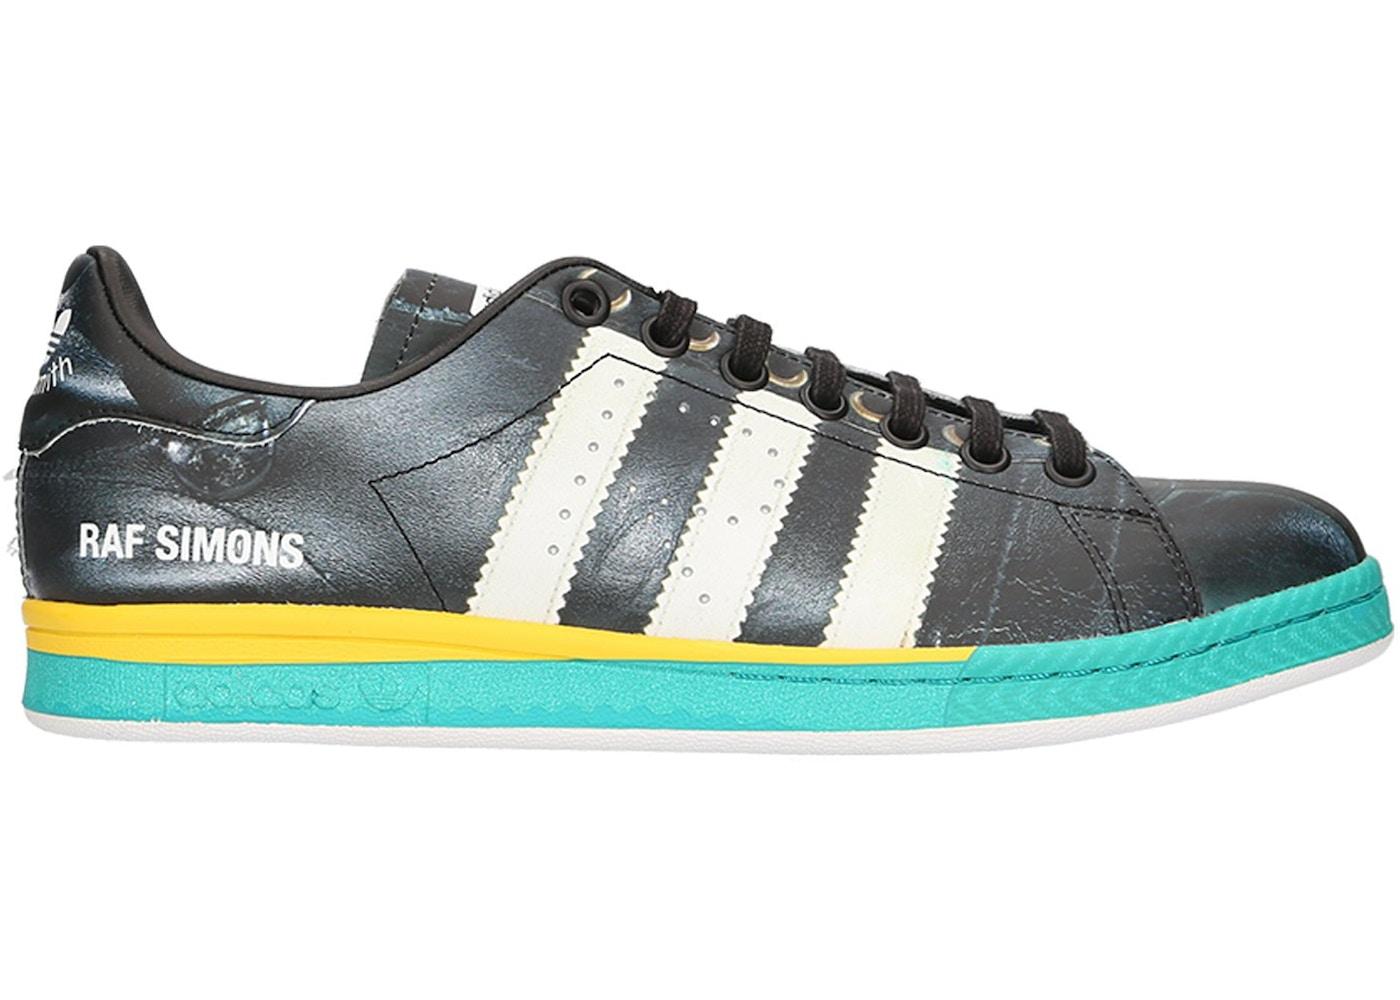 sports shoes 67eca cfe05 adidas Samba Stan Smith Raf Simons Black White Bright Blue